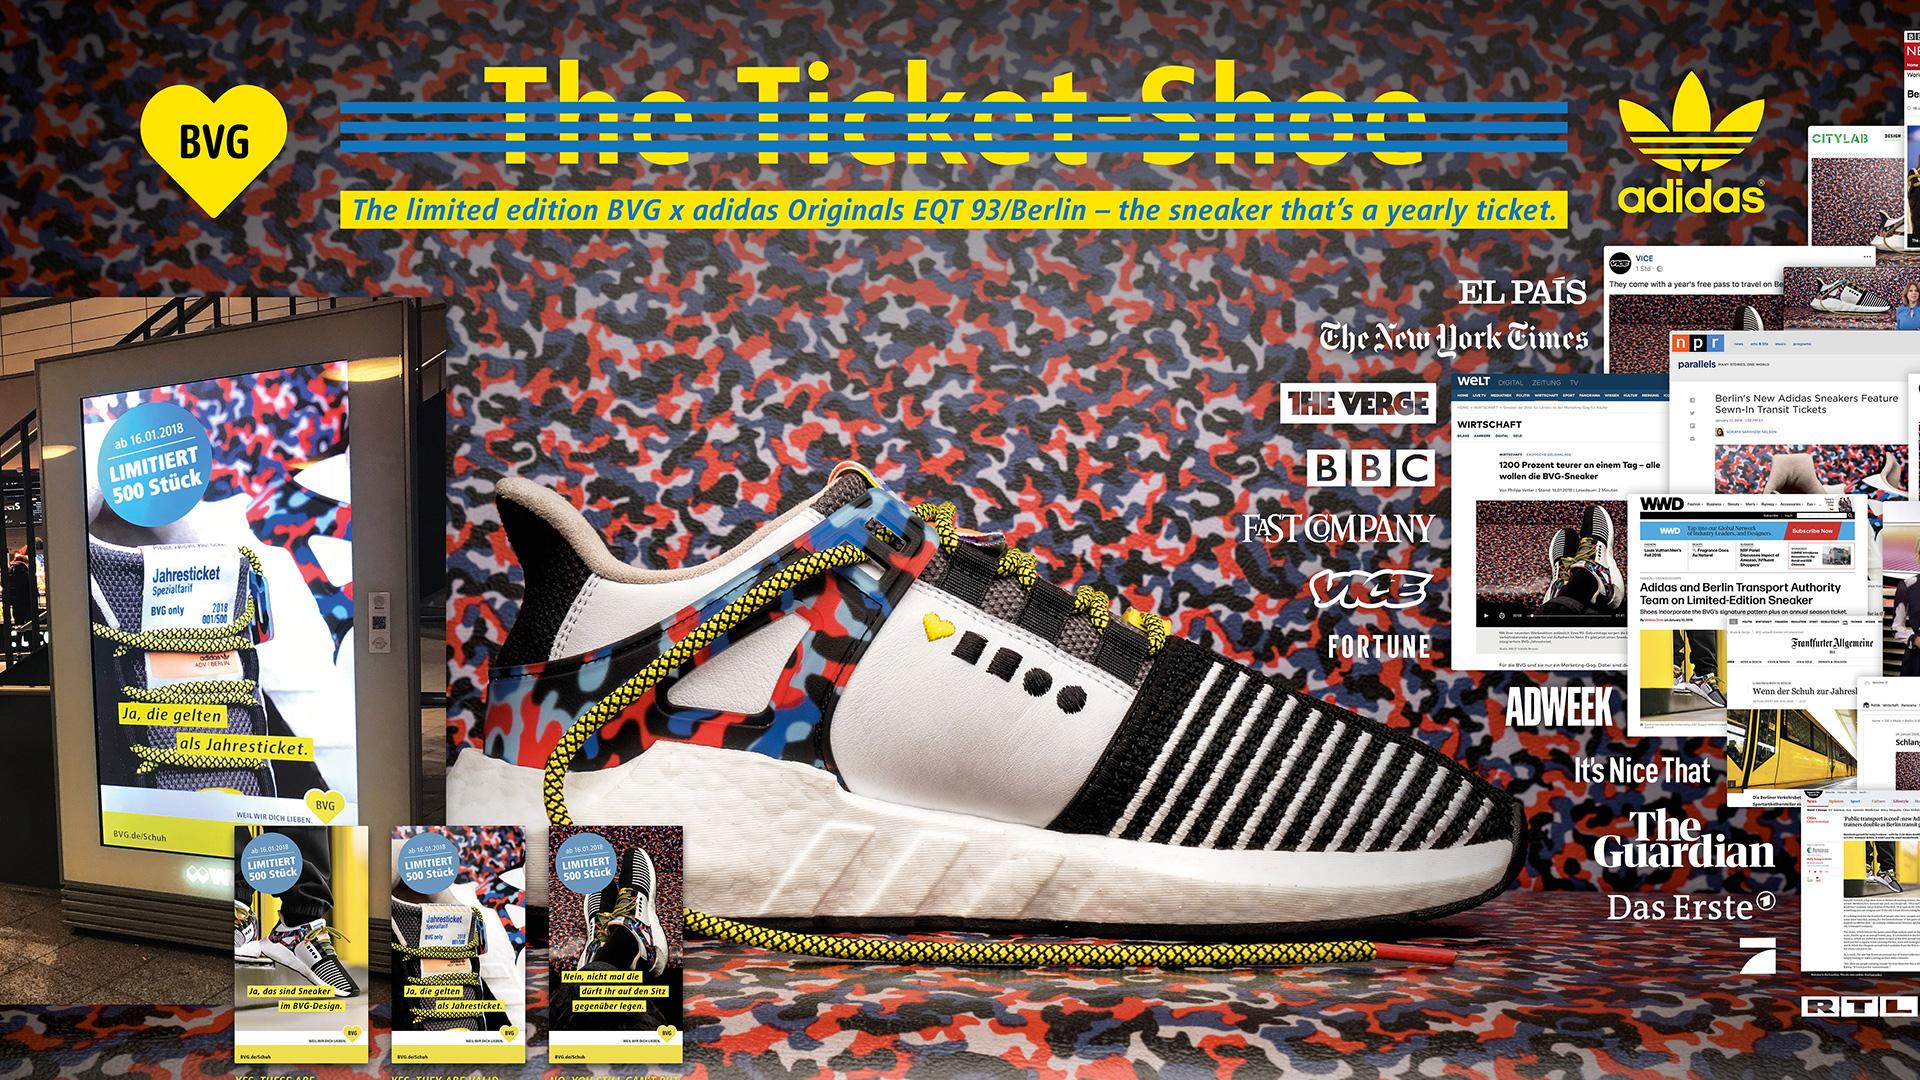 Bvg Aq5jlr34 Buy Ea891 Shoe The X C546e Adidas Ticket Online l1JKTcF3